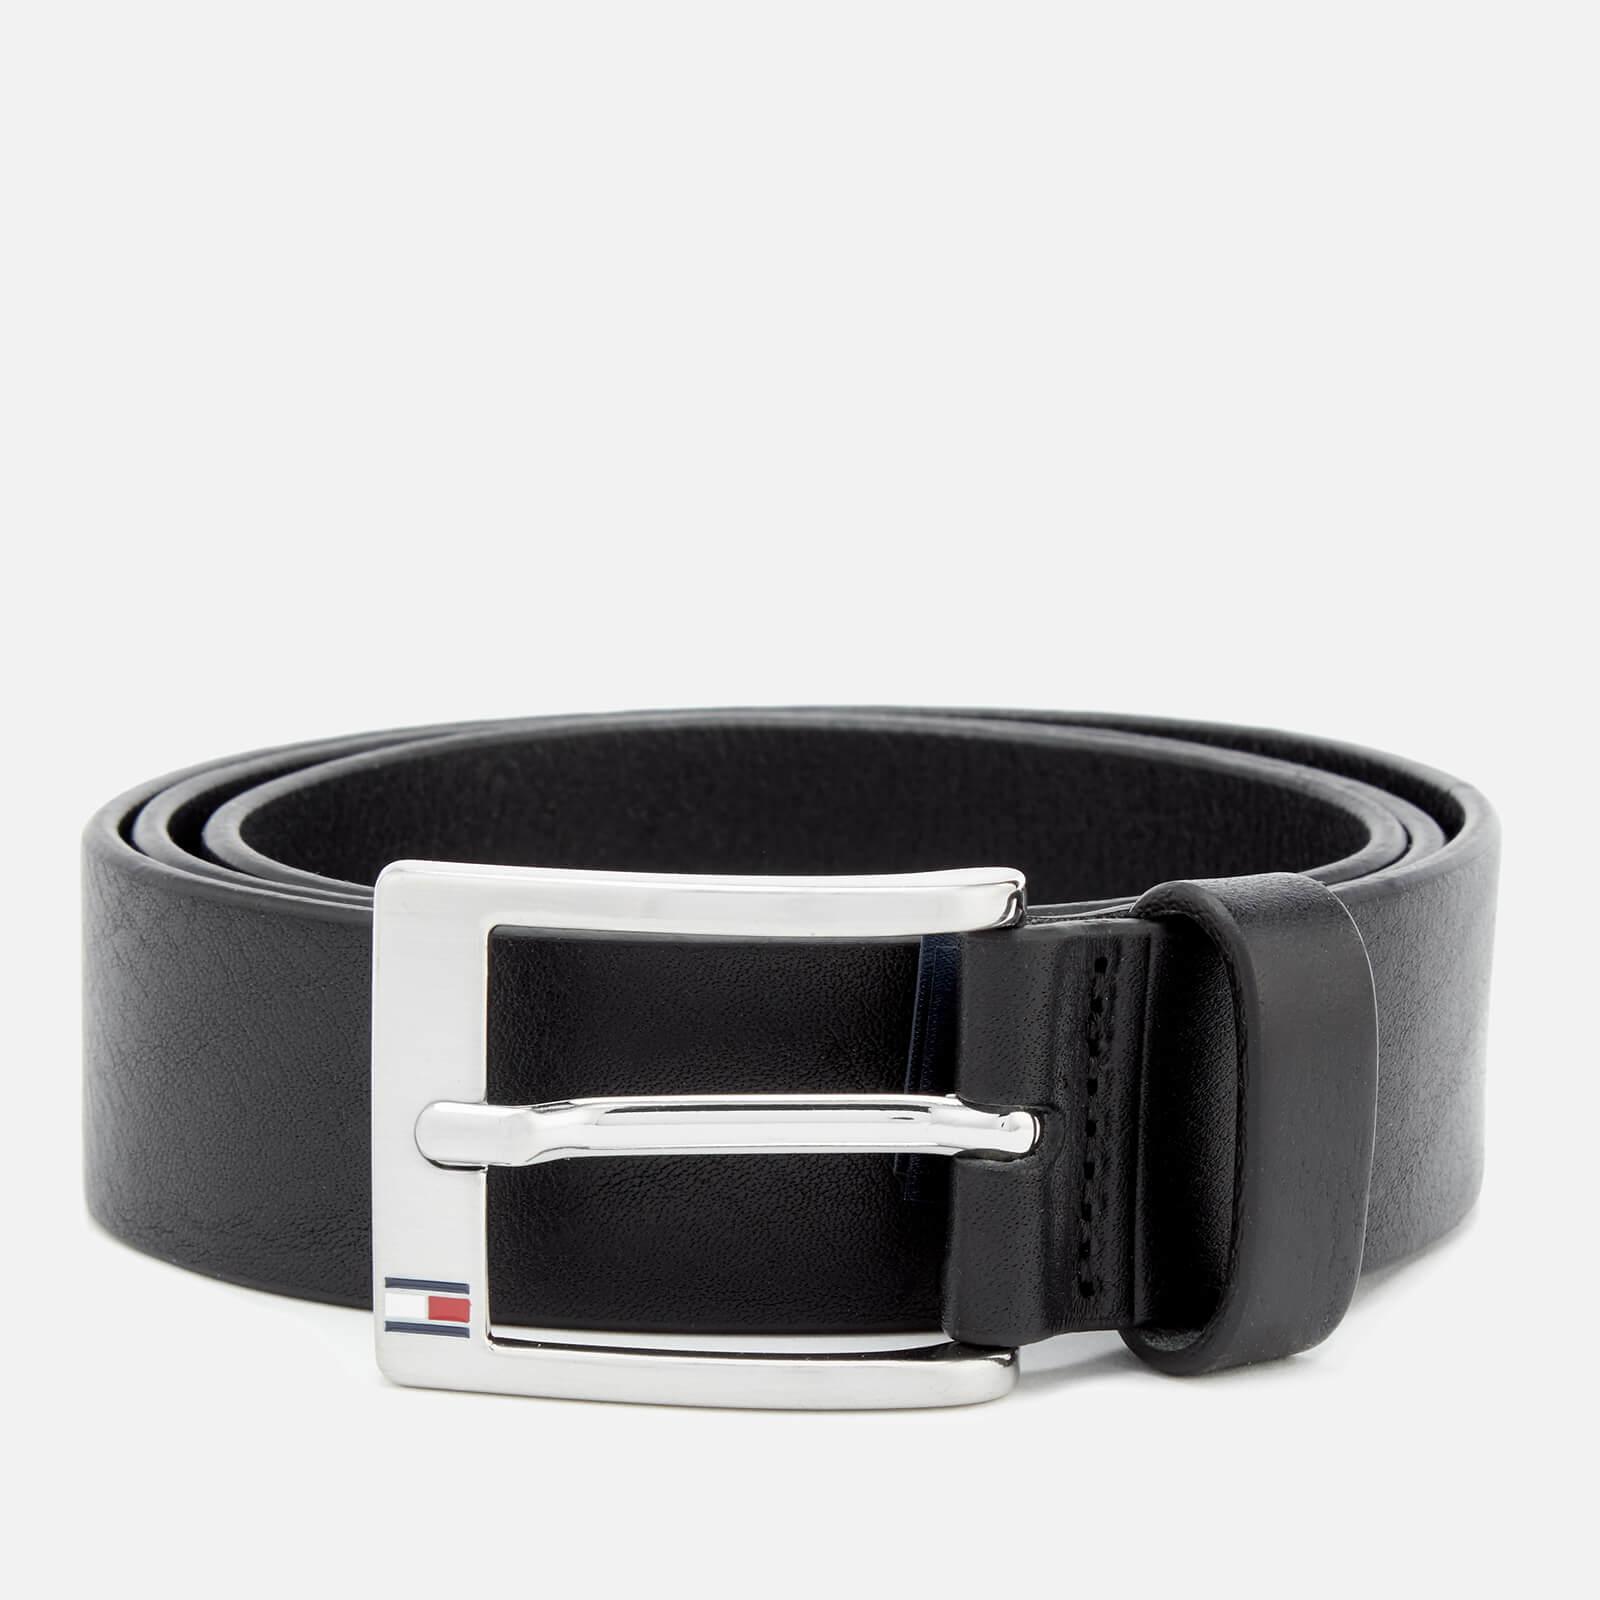 Tommy Hilfiger Men's New Aly Belt - Black - 105cm/XXL - Black